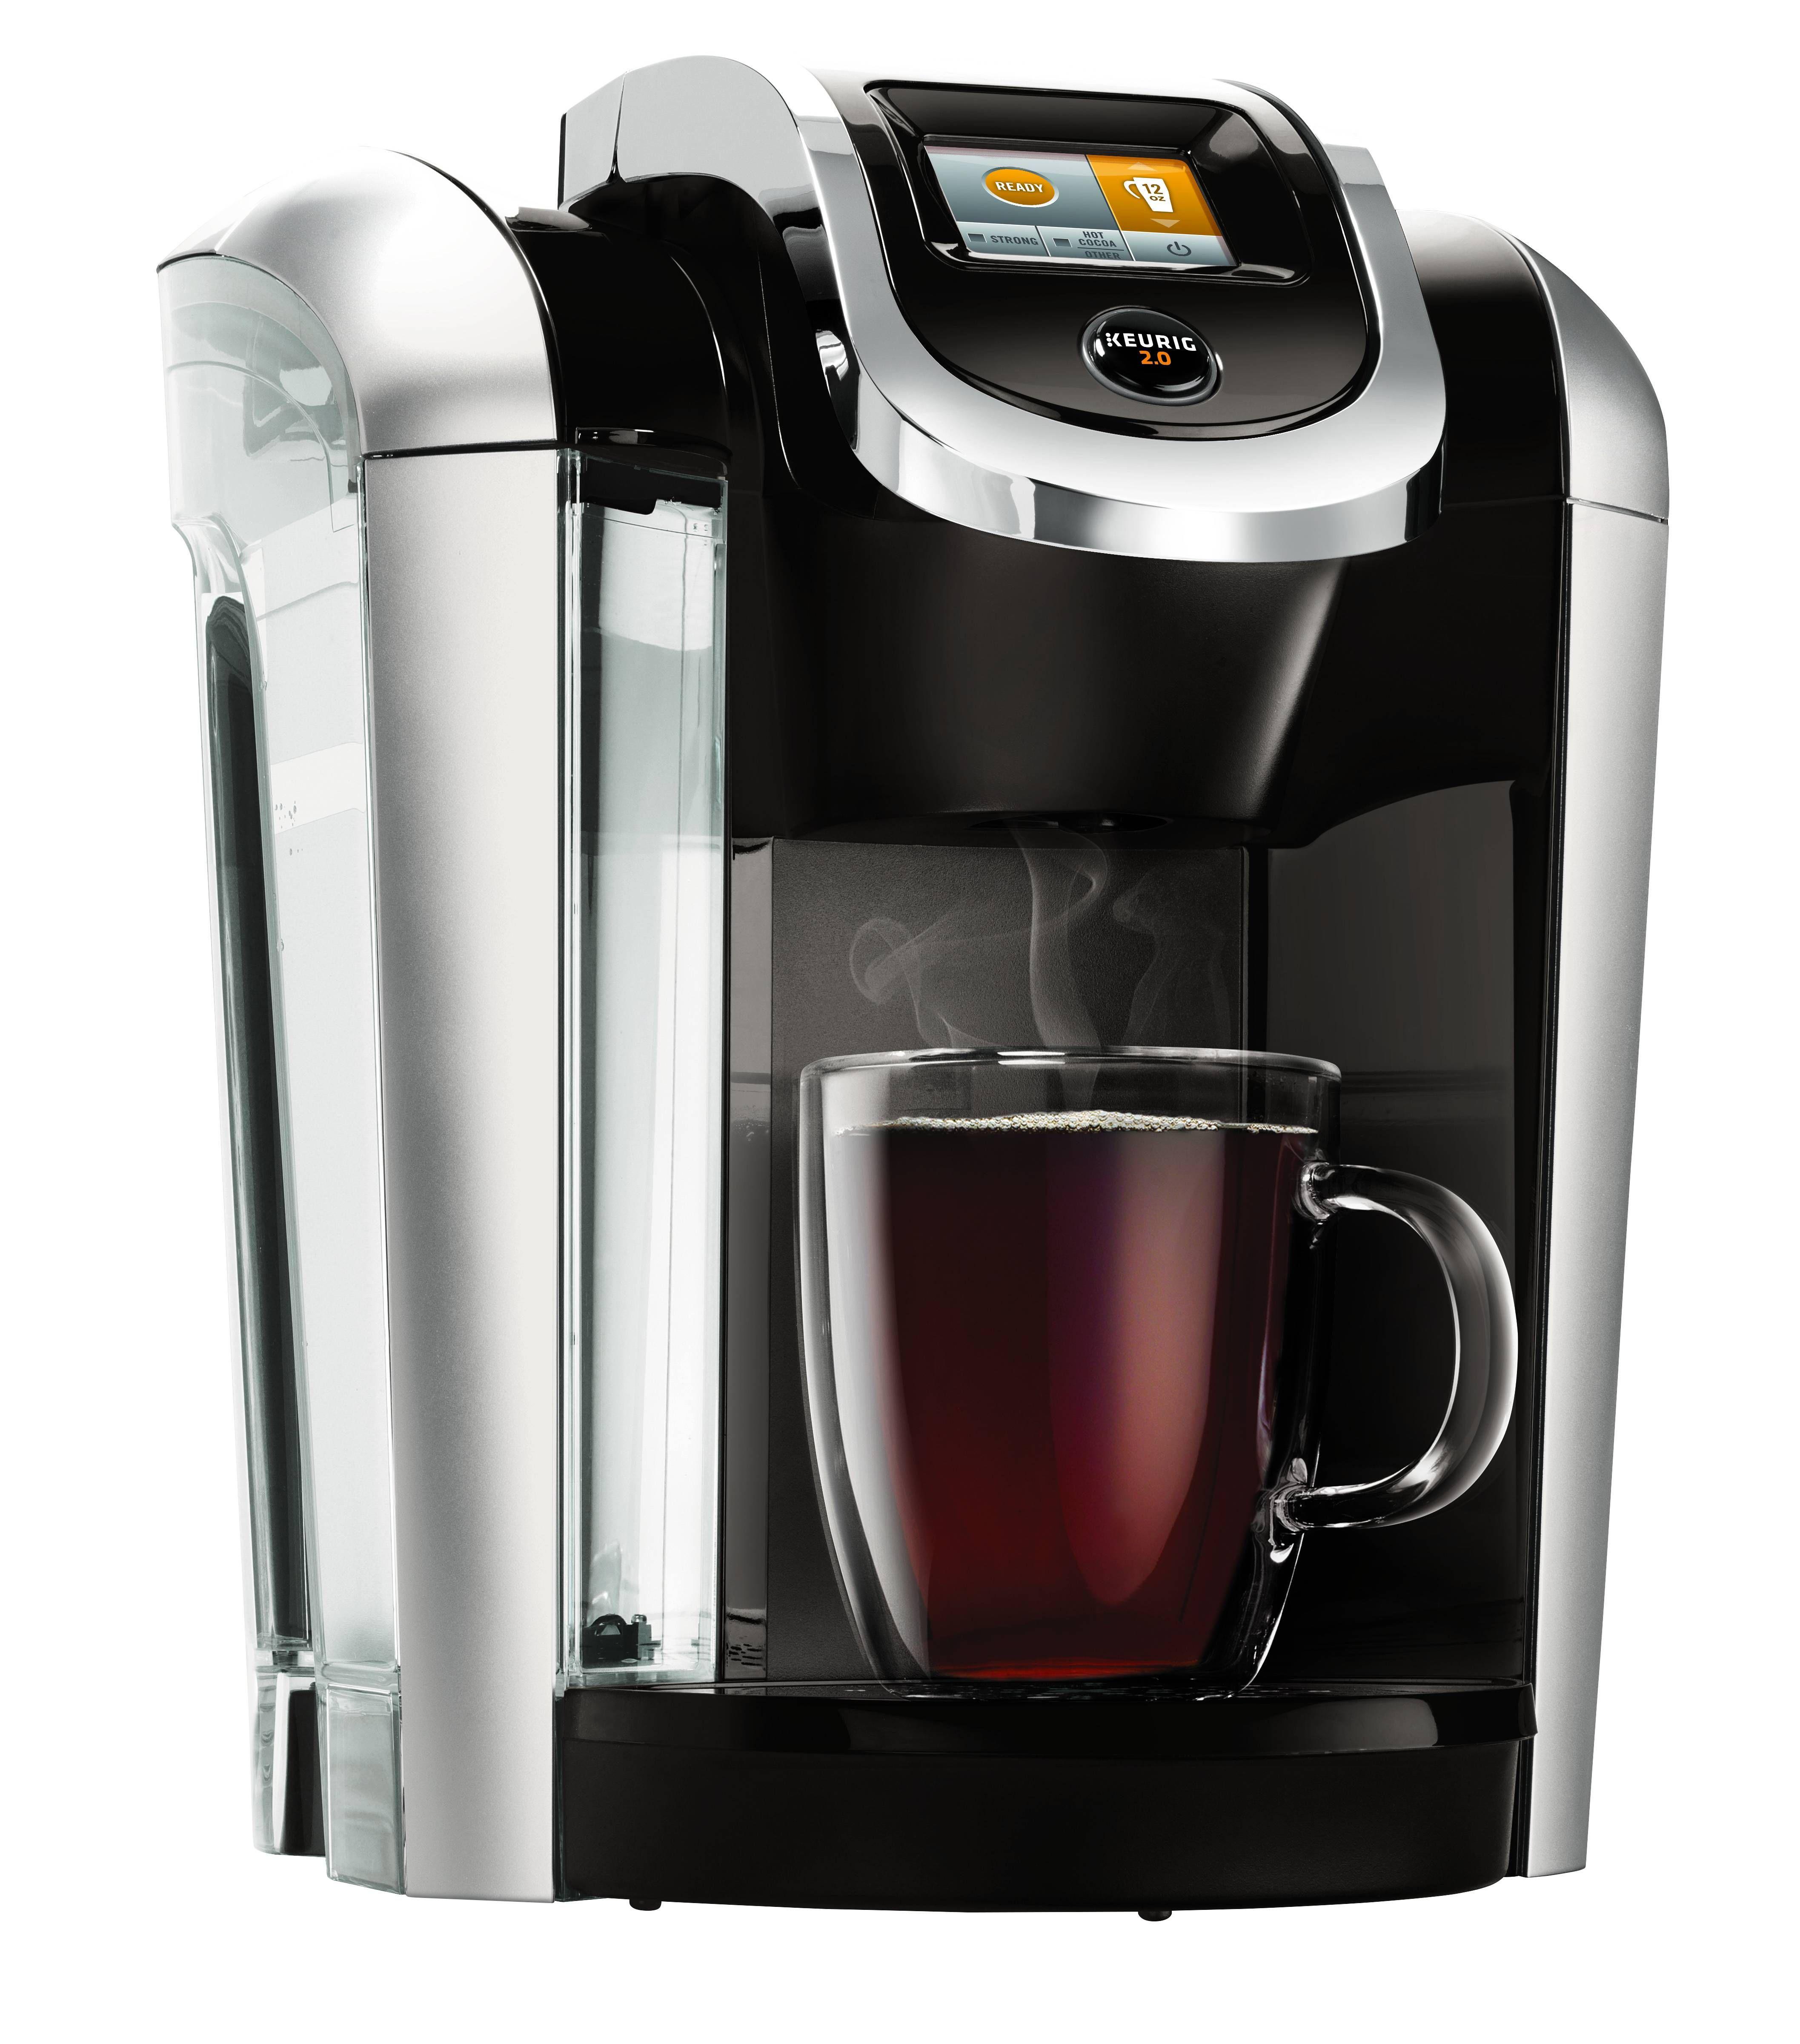 Keurig K Classic Single Serve K Cup Pod Coffee Maker Black Walmart Com Keurig Keurig Coffee Makers Single Serve Coffee